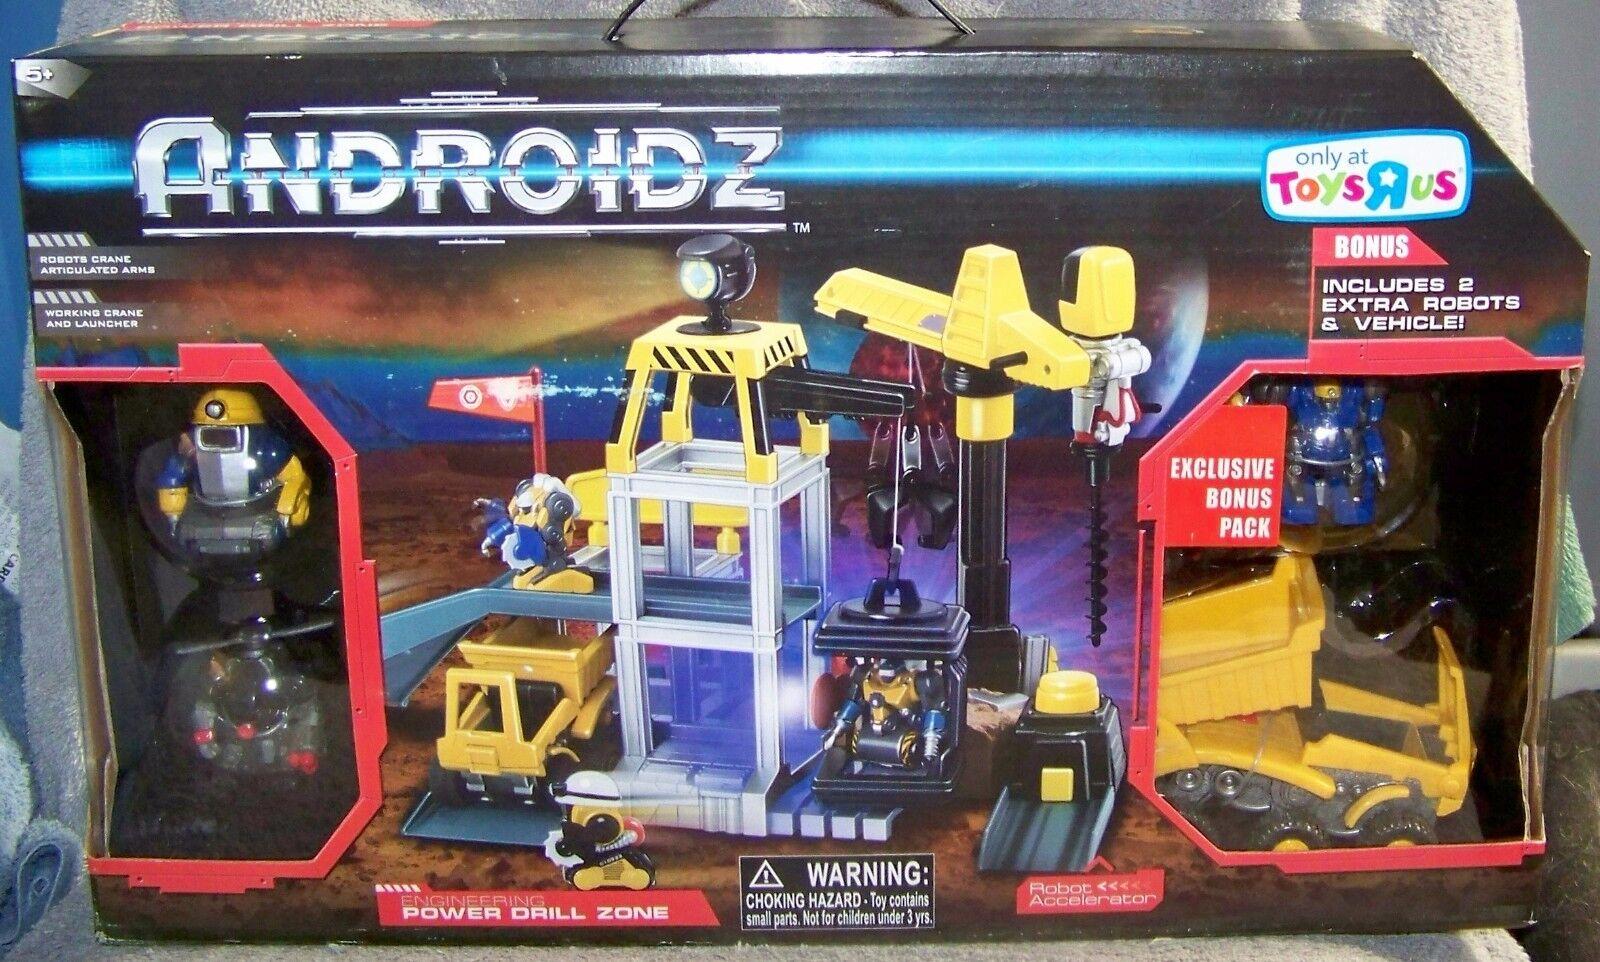 ANDROIDZ POWER DRILL ZONE BONUS PLAYSET W VEHICLE & 3 ROBOTS TOYS R US EXCLUSIVE